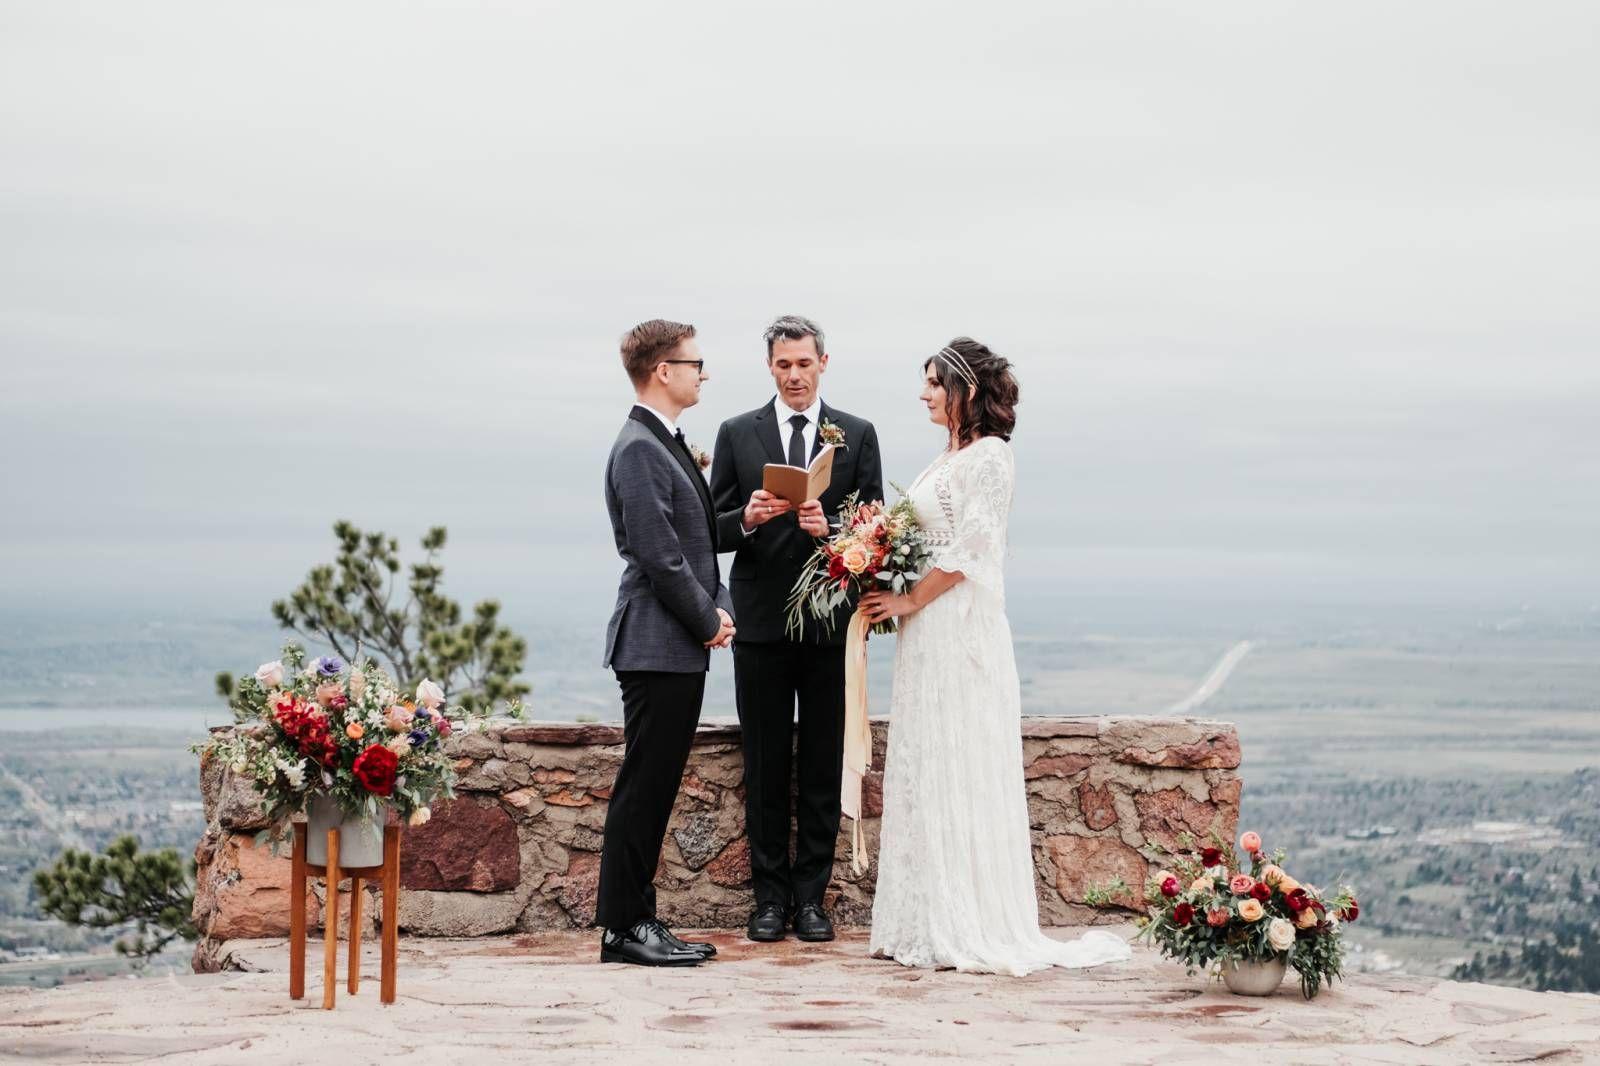 Sunrise Amphitheater Elopement Outdoor Wedding Outdoor Wedding Venues Romantic Outdoor Wedding